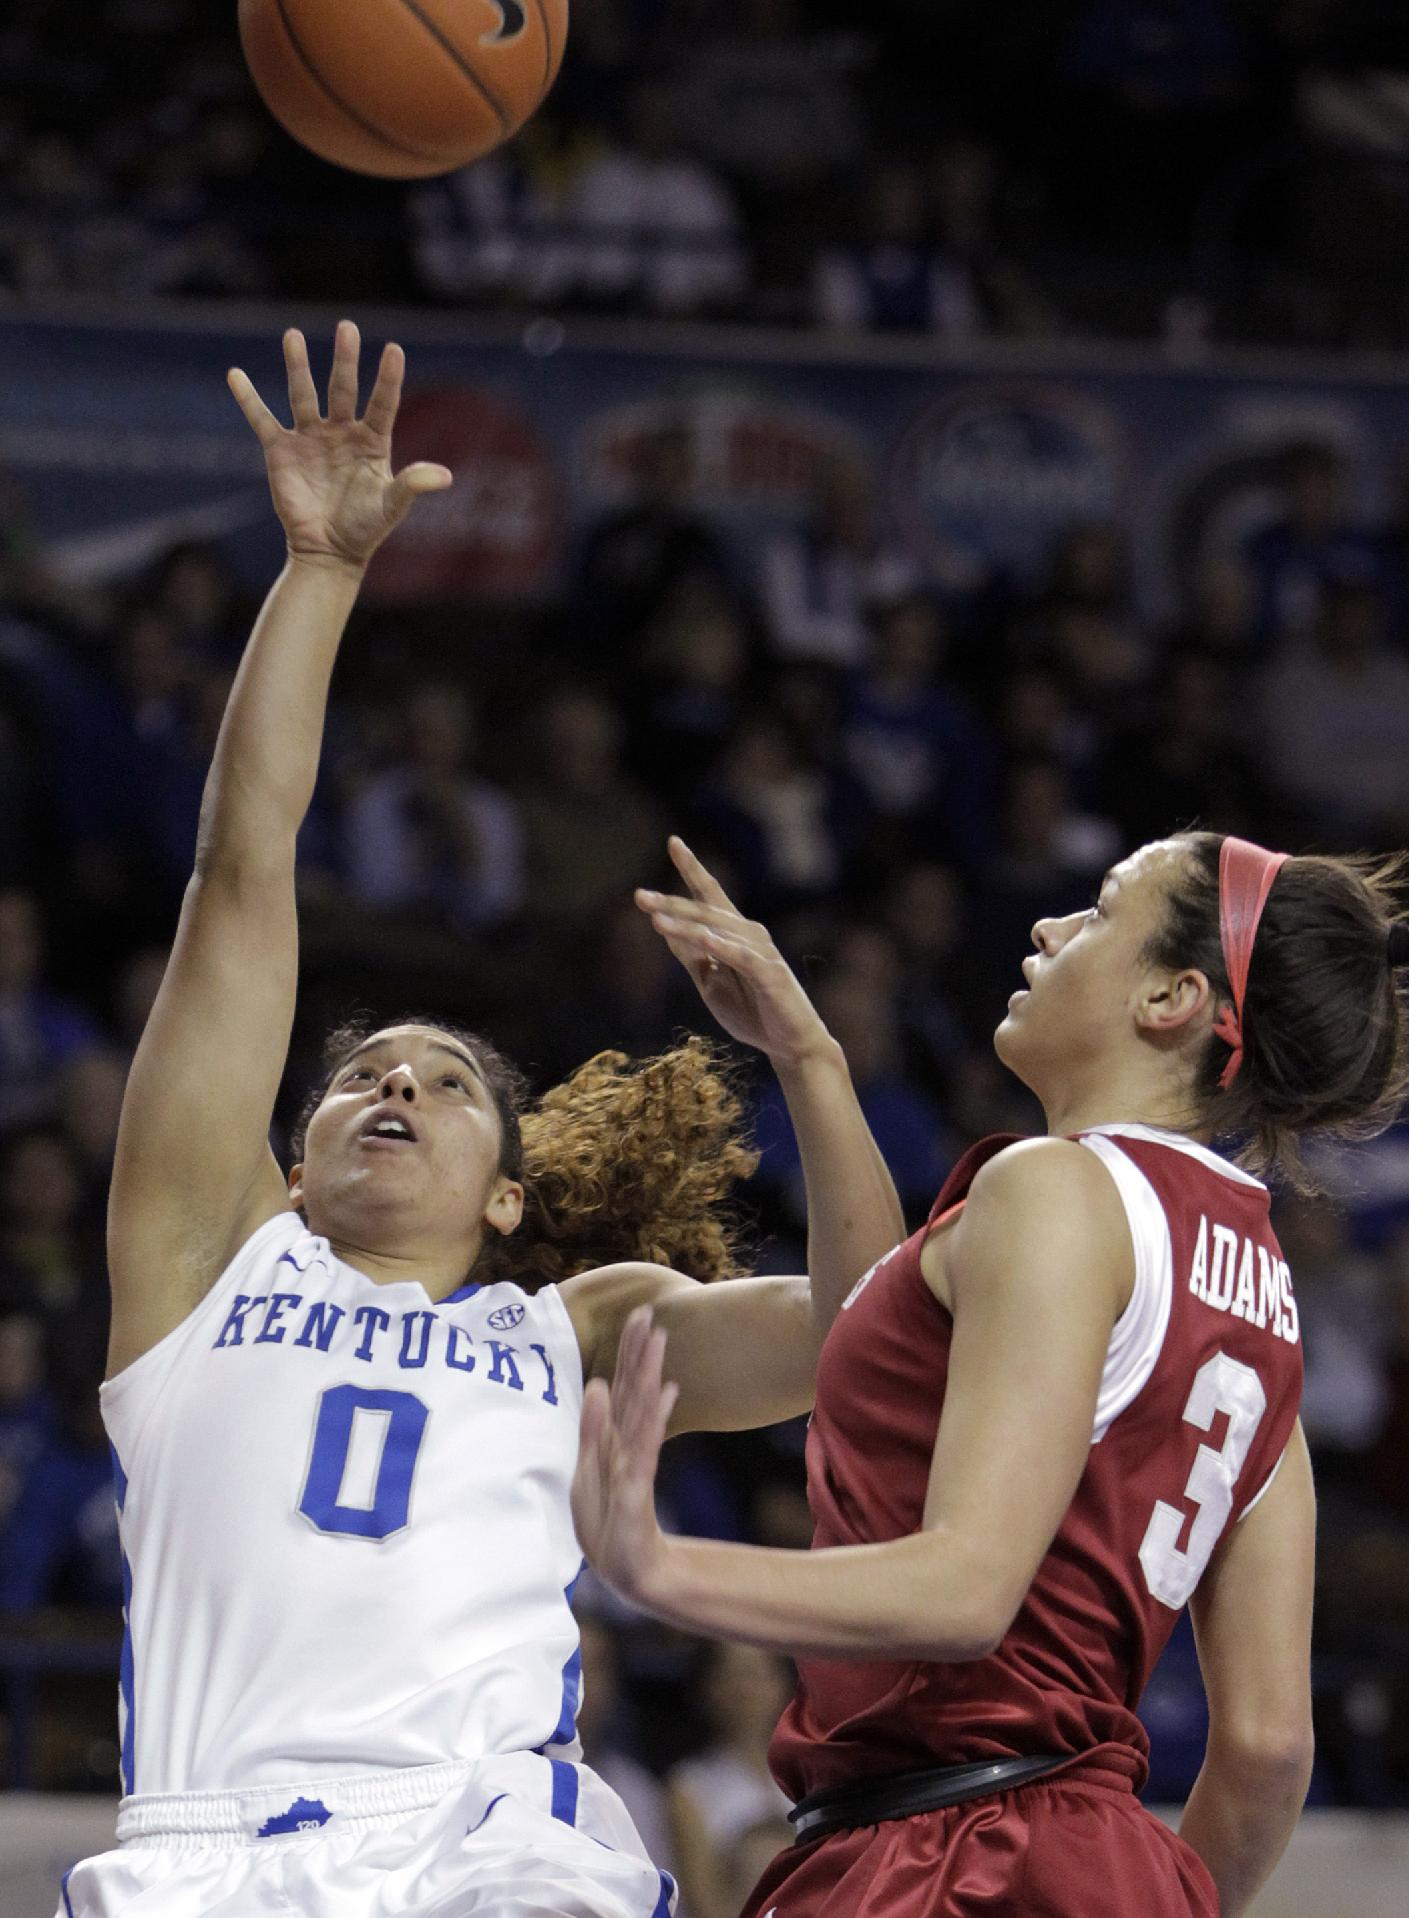 Kentucky's Jennifer O'Neill (0) shoots as Arkansas' McKenzie Adams (3) defends during the first half of NCAA college basketball game, Sunday, Jan. 26, 2014, in Lexington, Ky